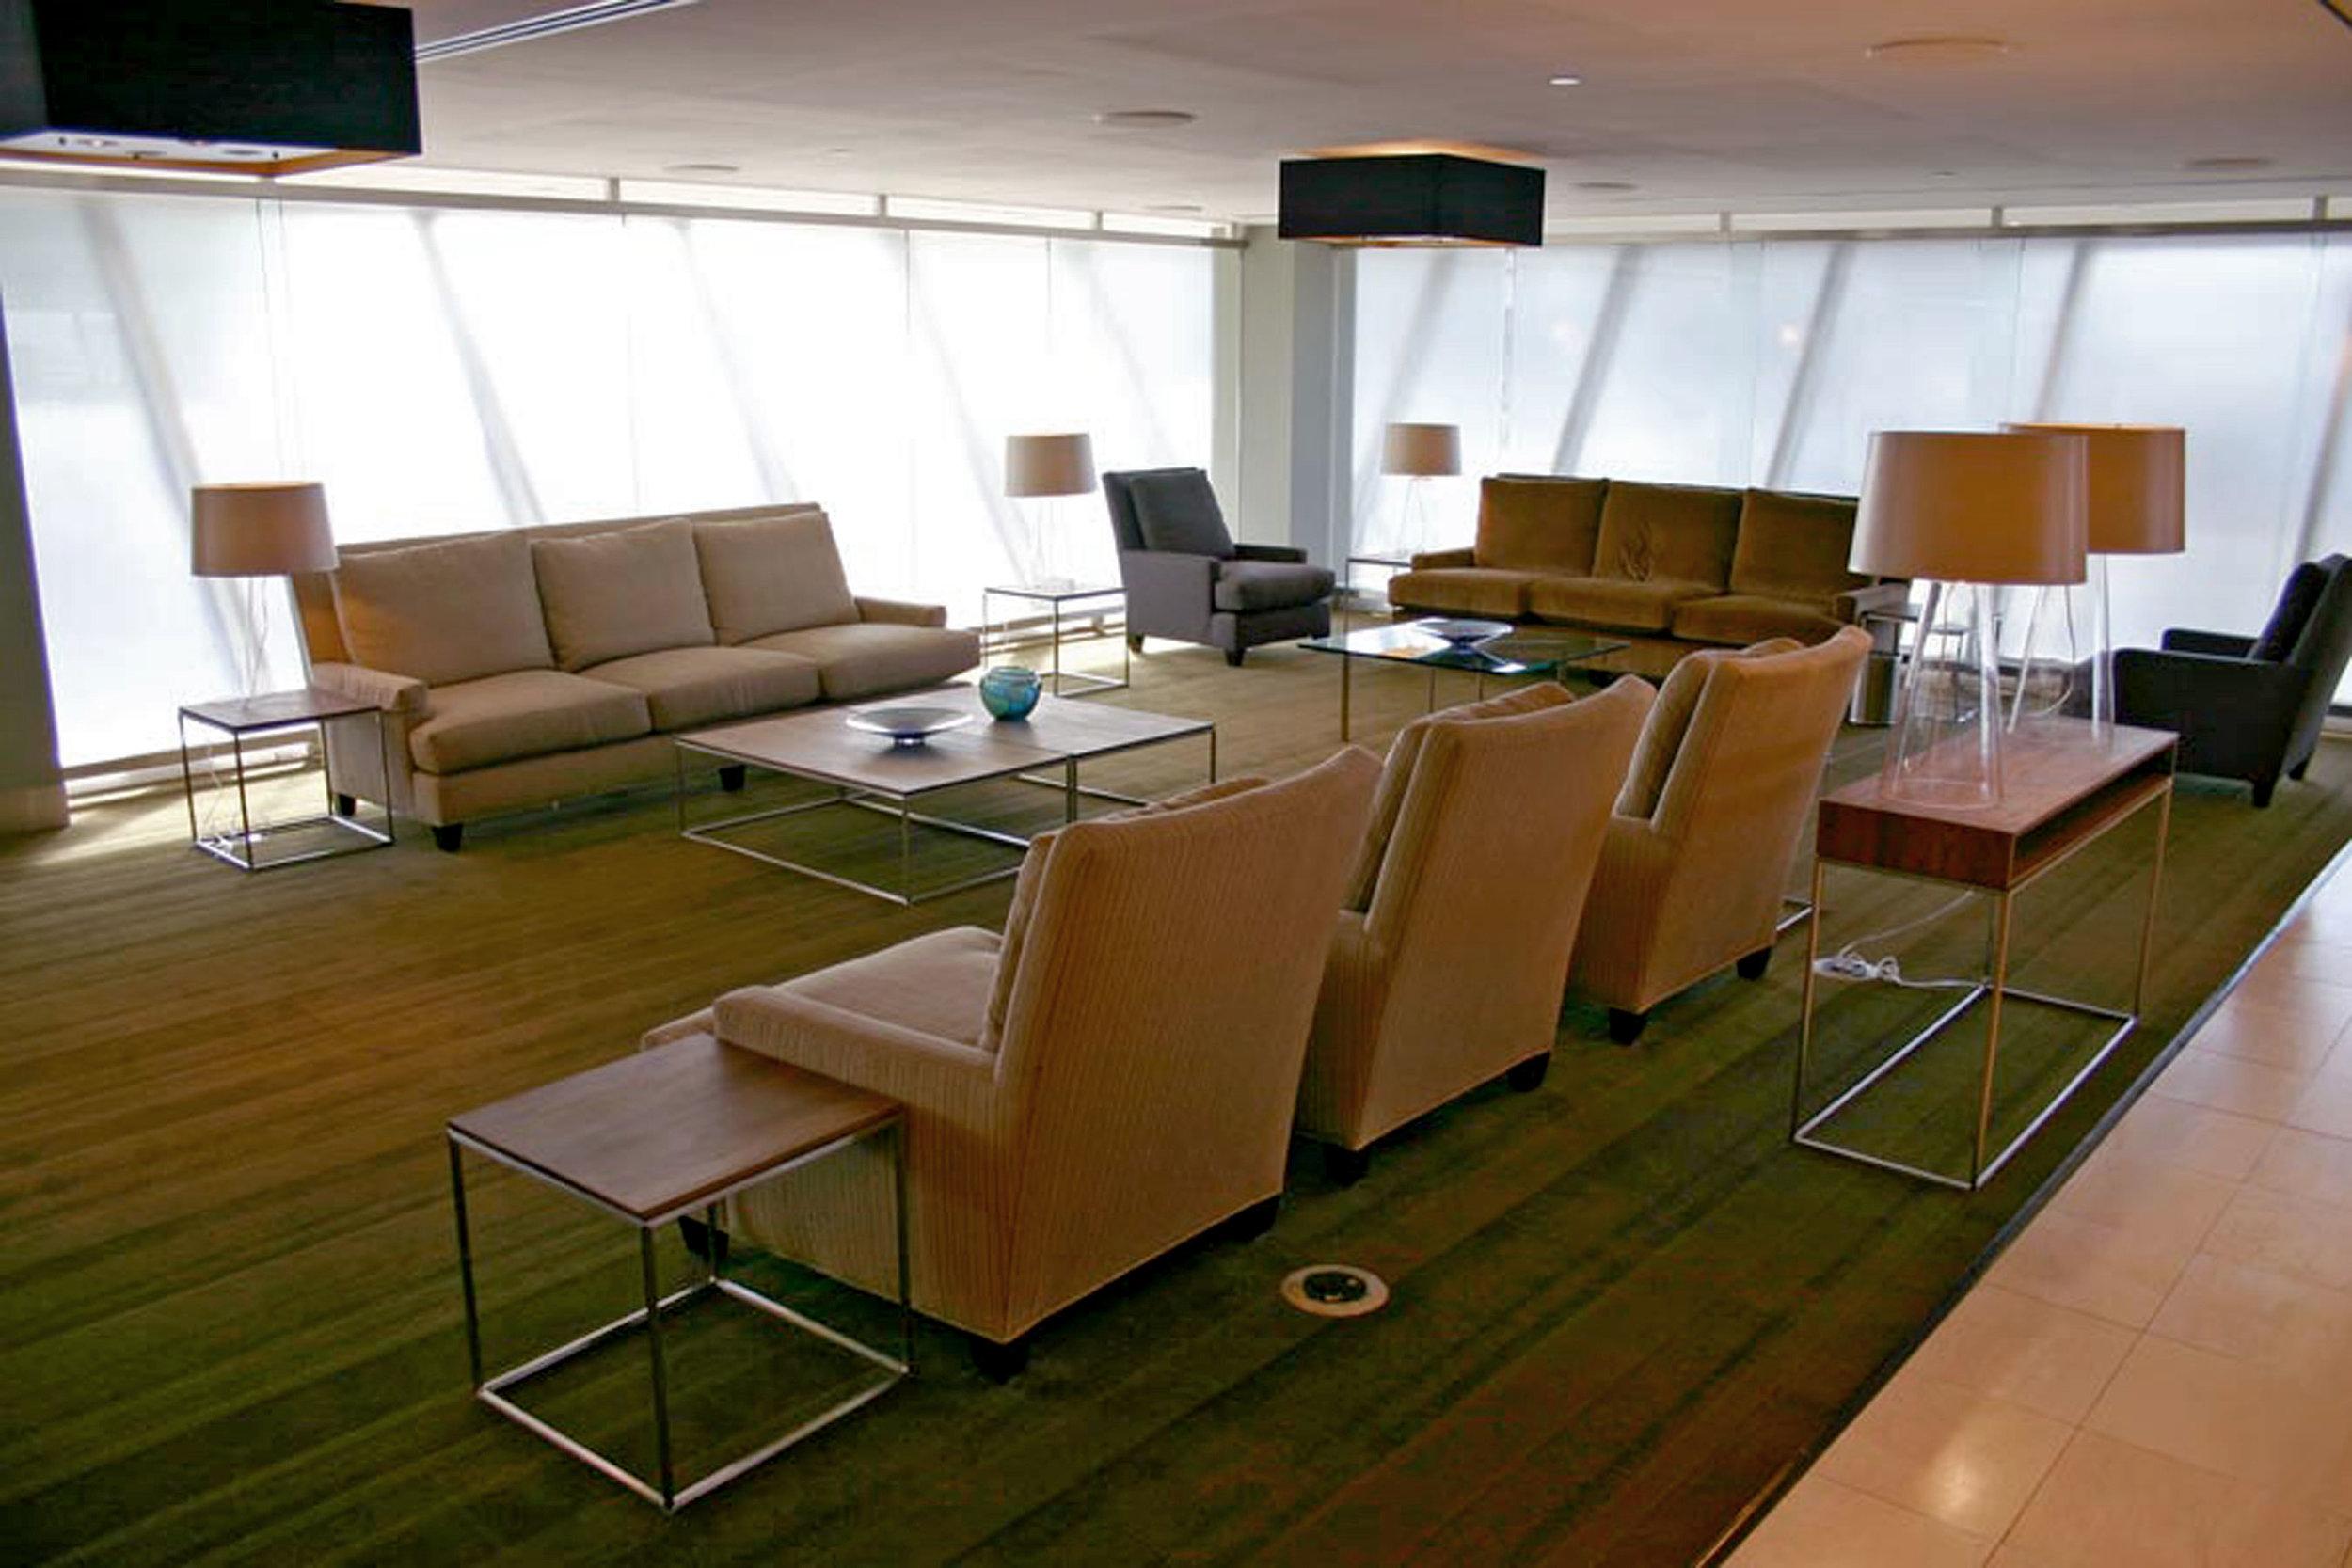 SENTIENT at JFK Airport in British Airways First Class Lounge